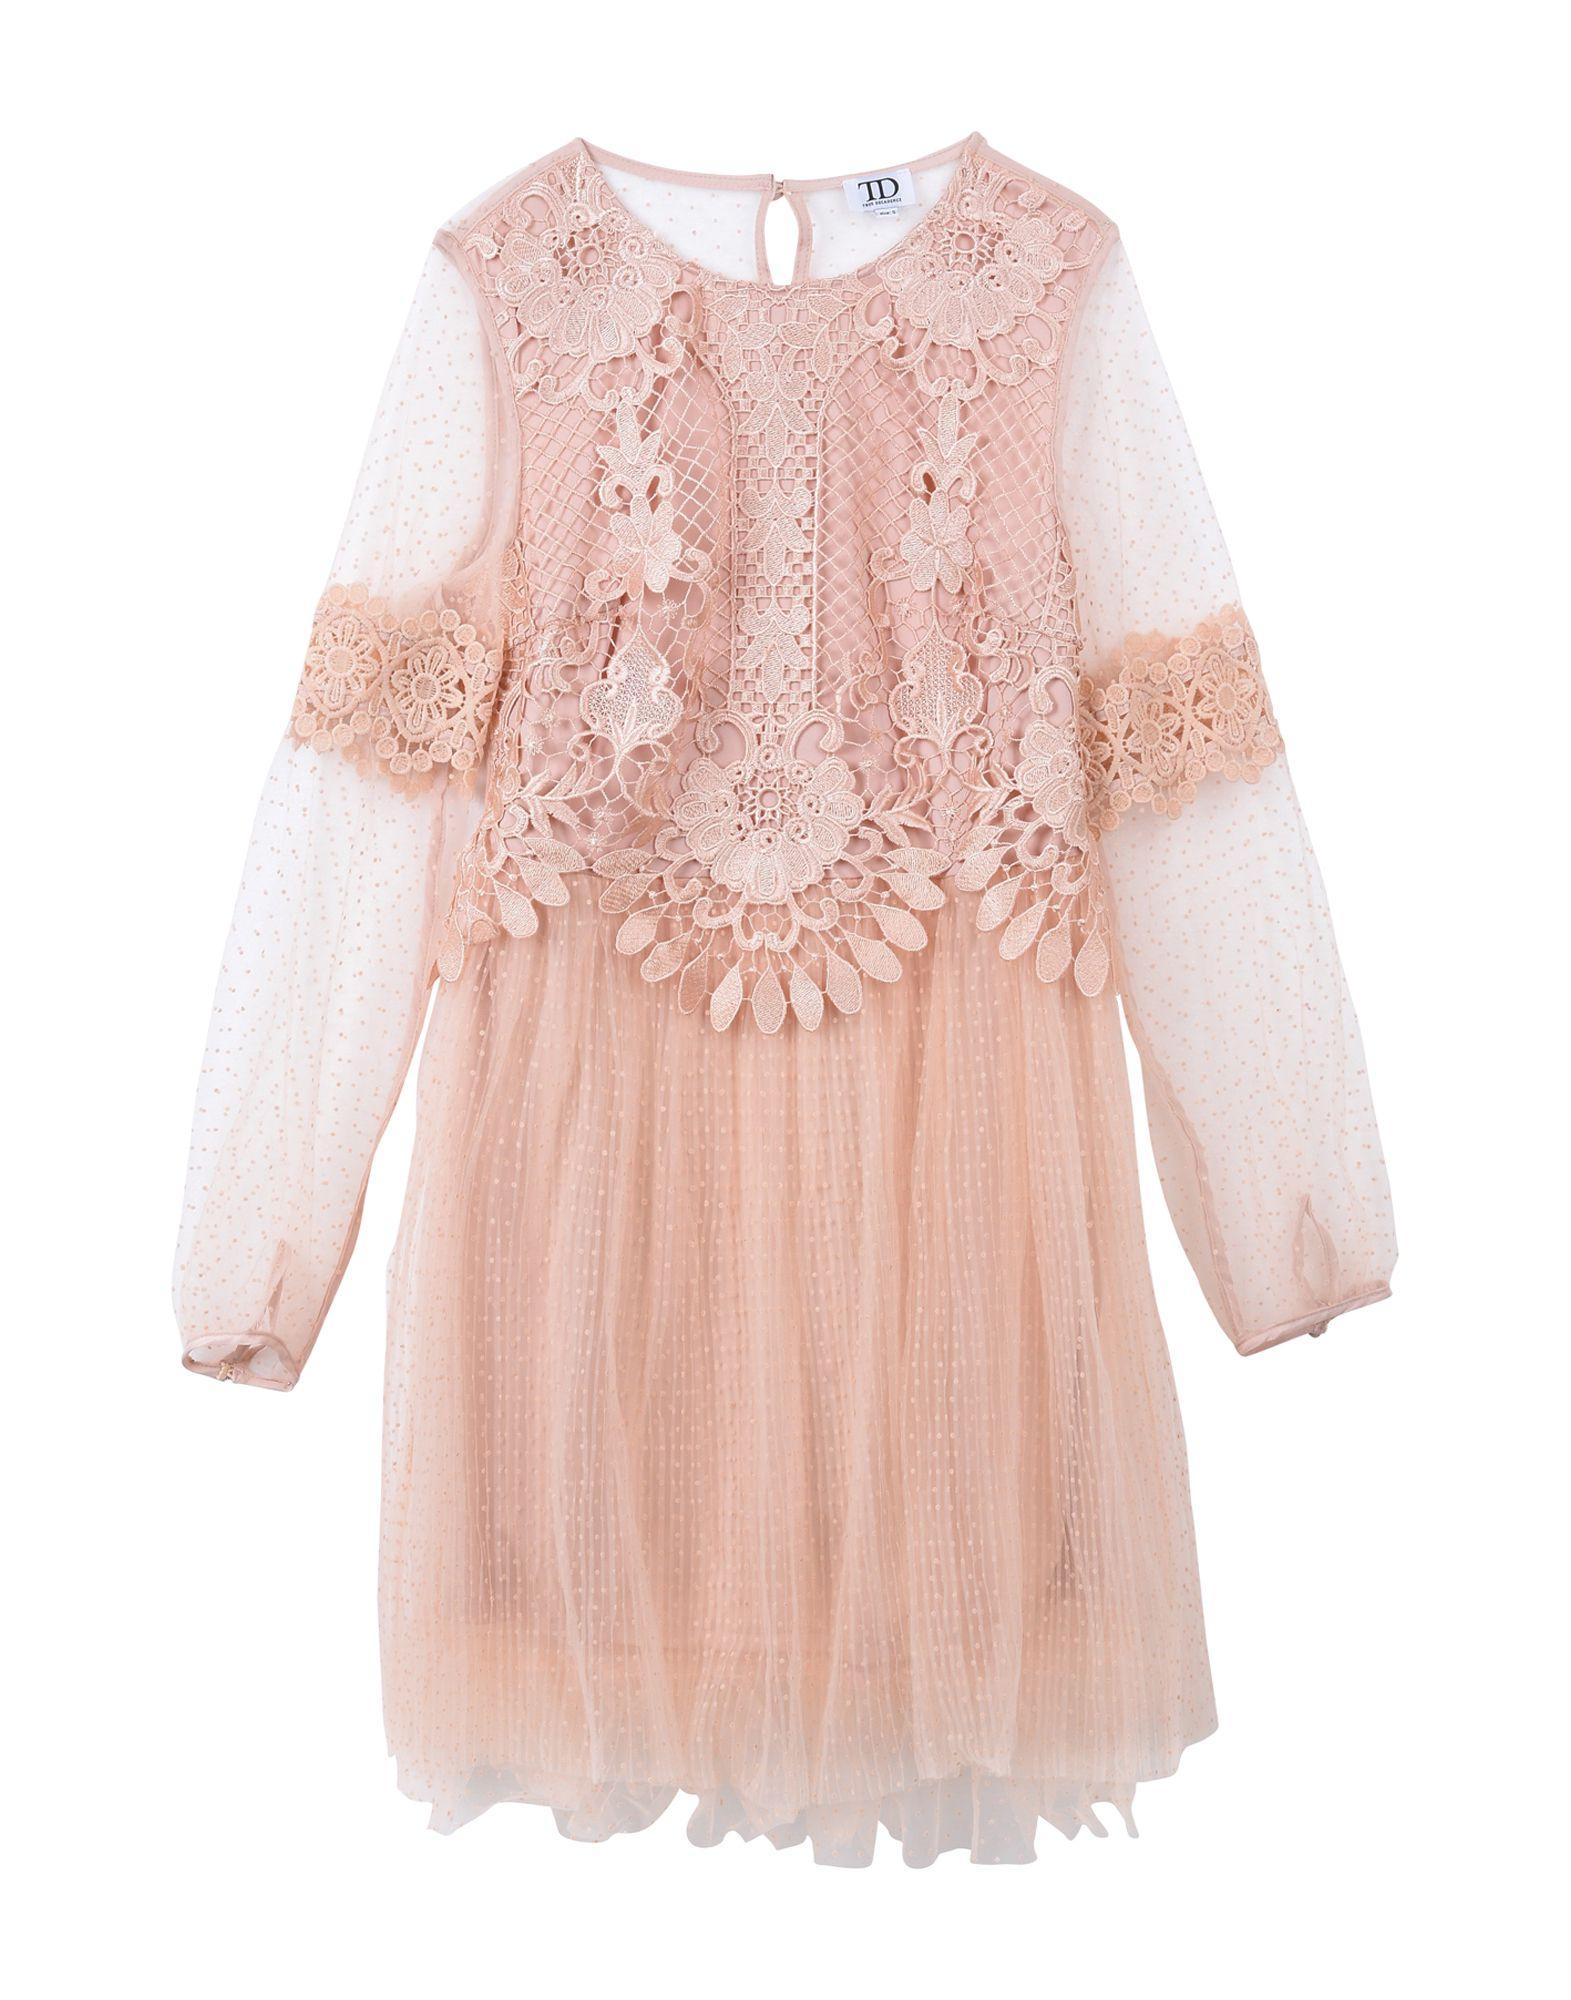 TD TRUE DECADENCE Короткое платье original lb050wq02 td03 display td 03 lb050wq2